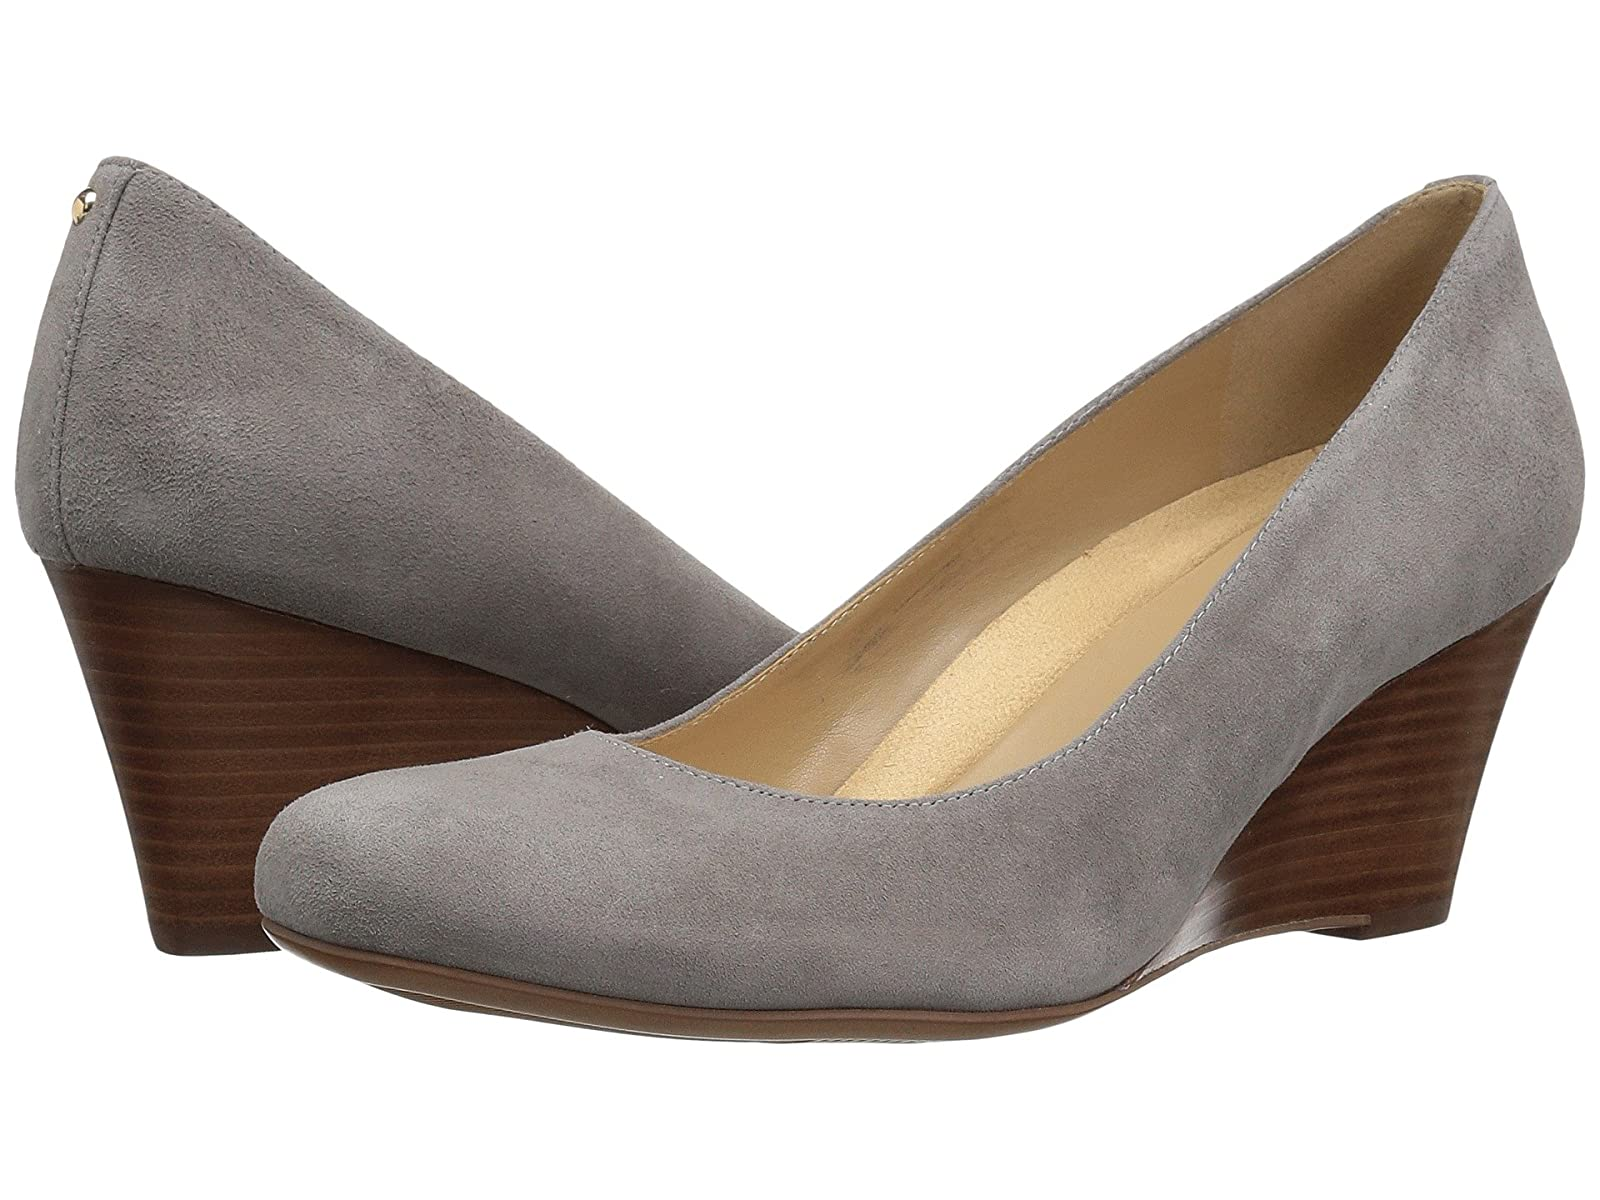 Naturalizer EmilyCheap and distinctive eye-catching shoes